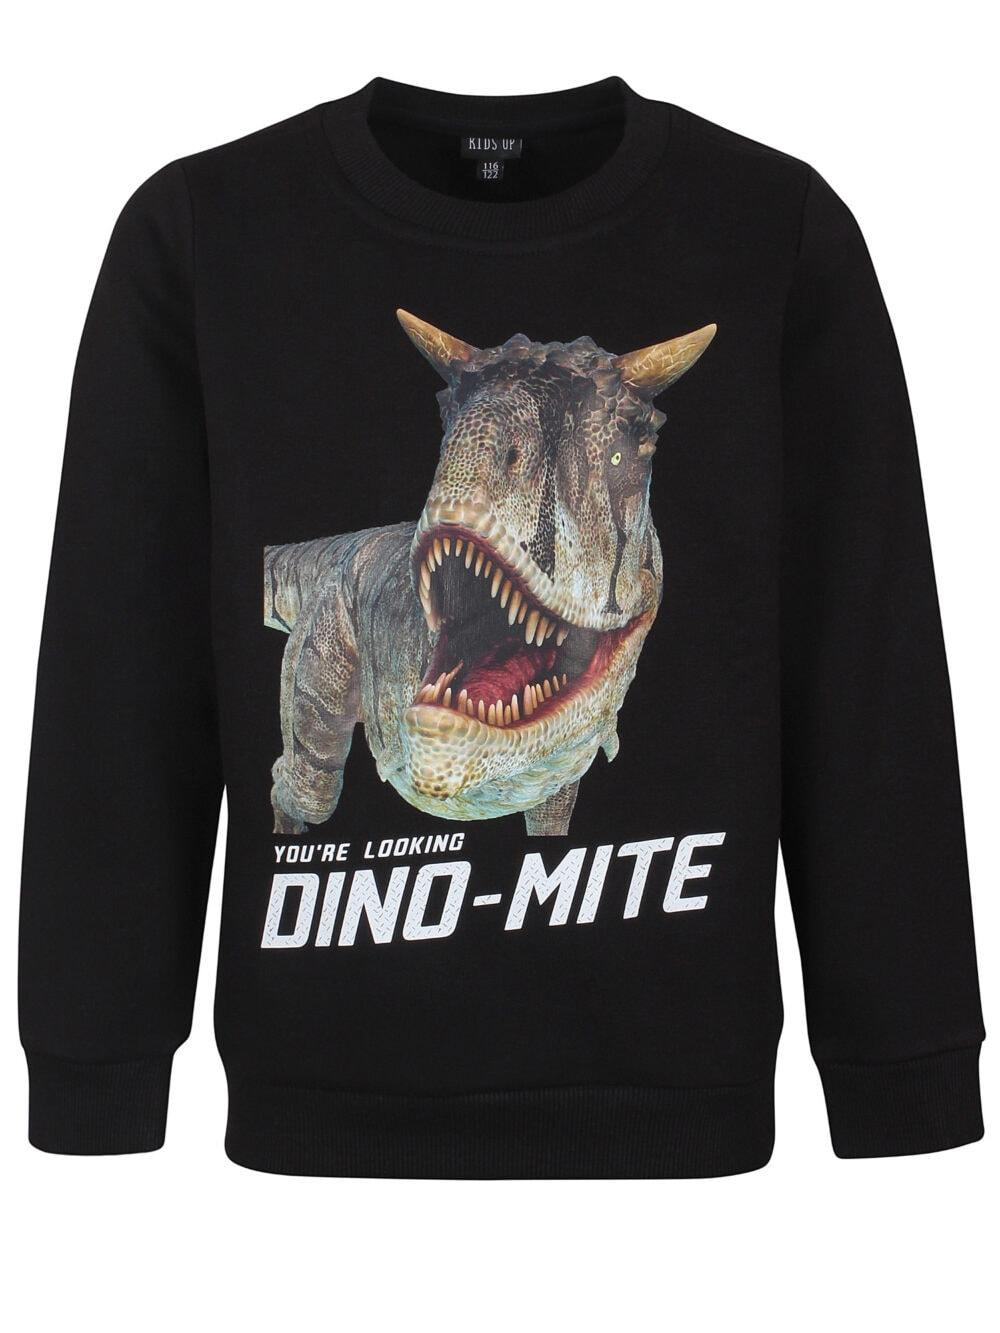 Kids Up Sweatshirt DINO-MITE Sort